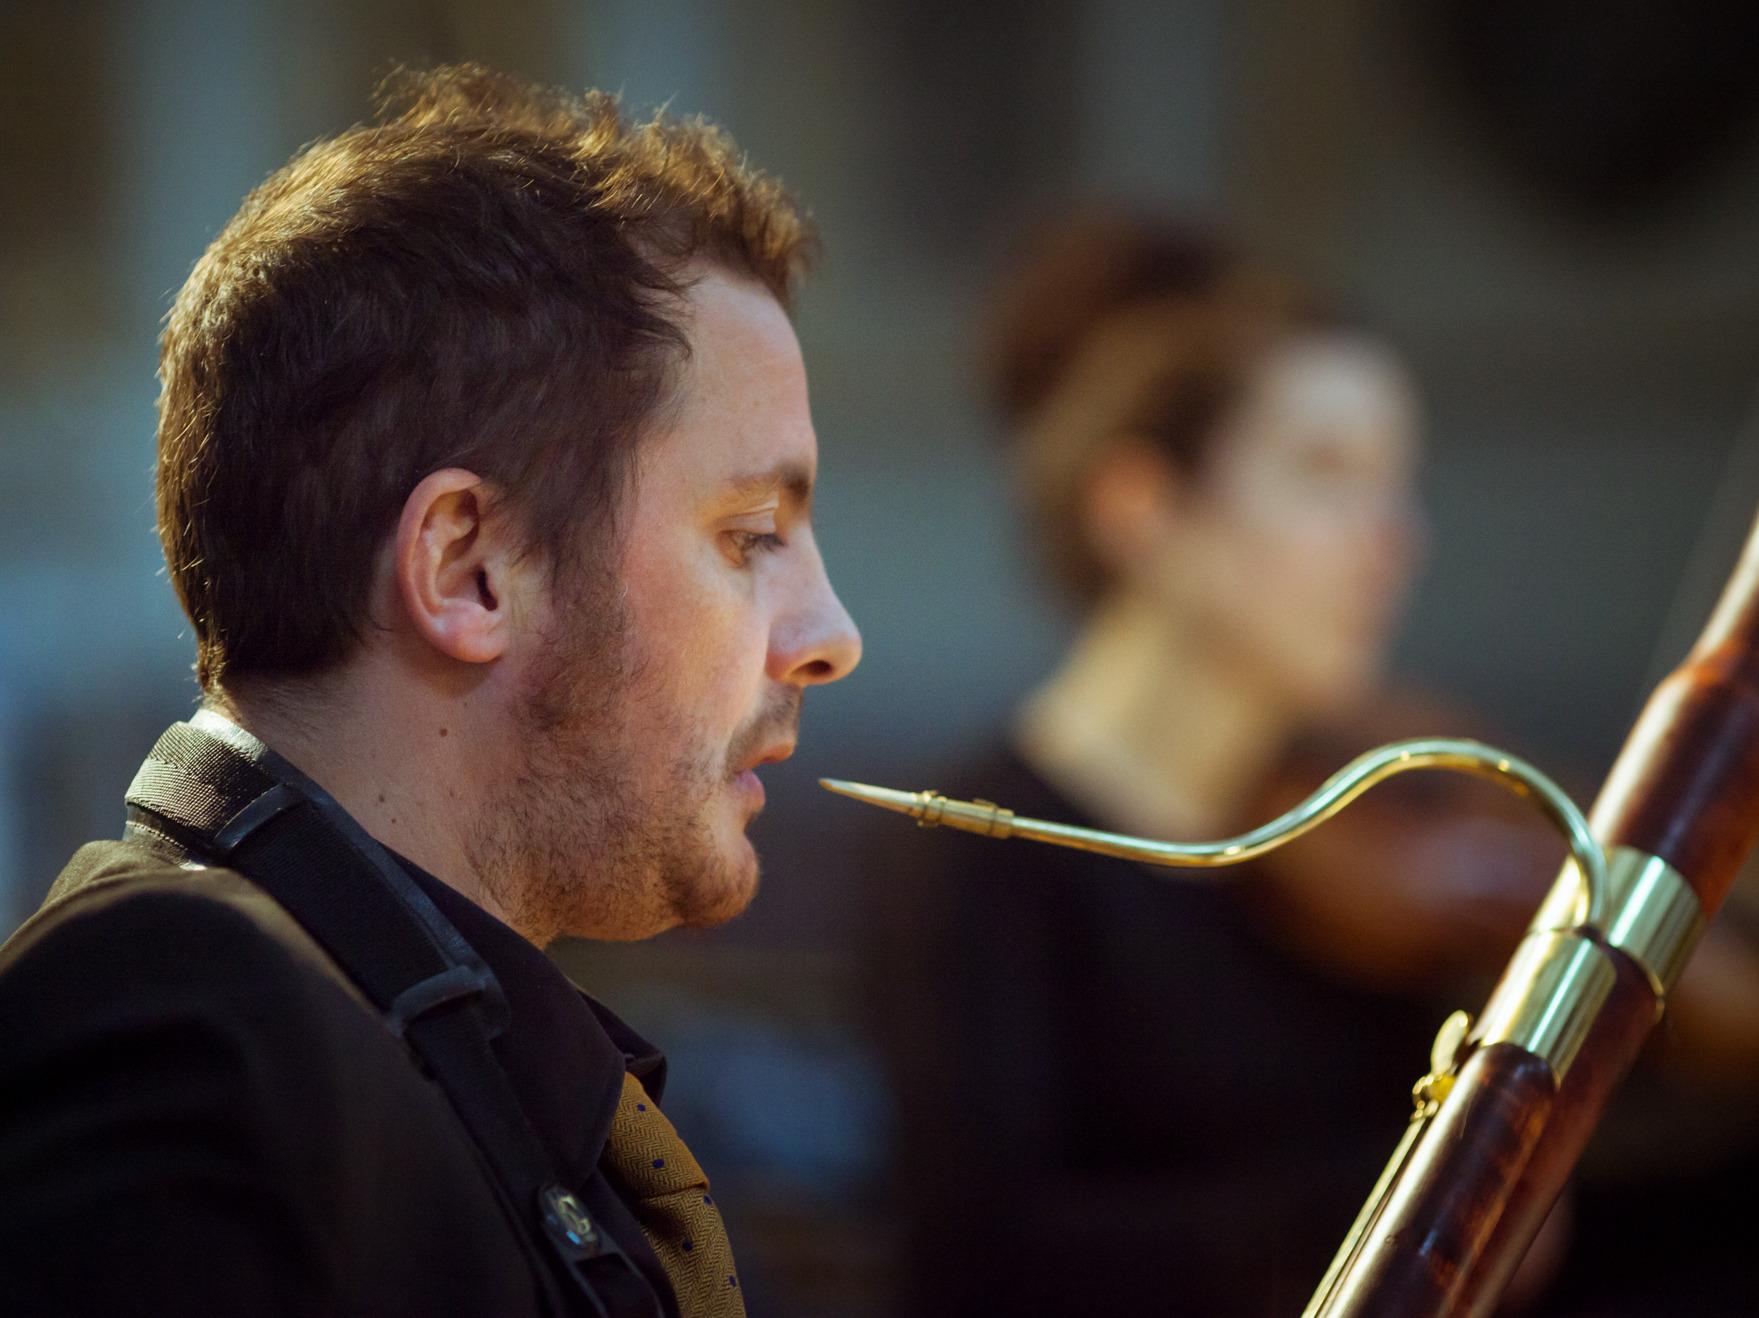 concert-hostel-dieu-BATS-pierre-basson-crédit-Julie-Cherki